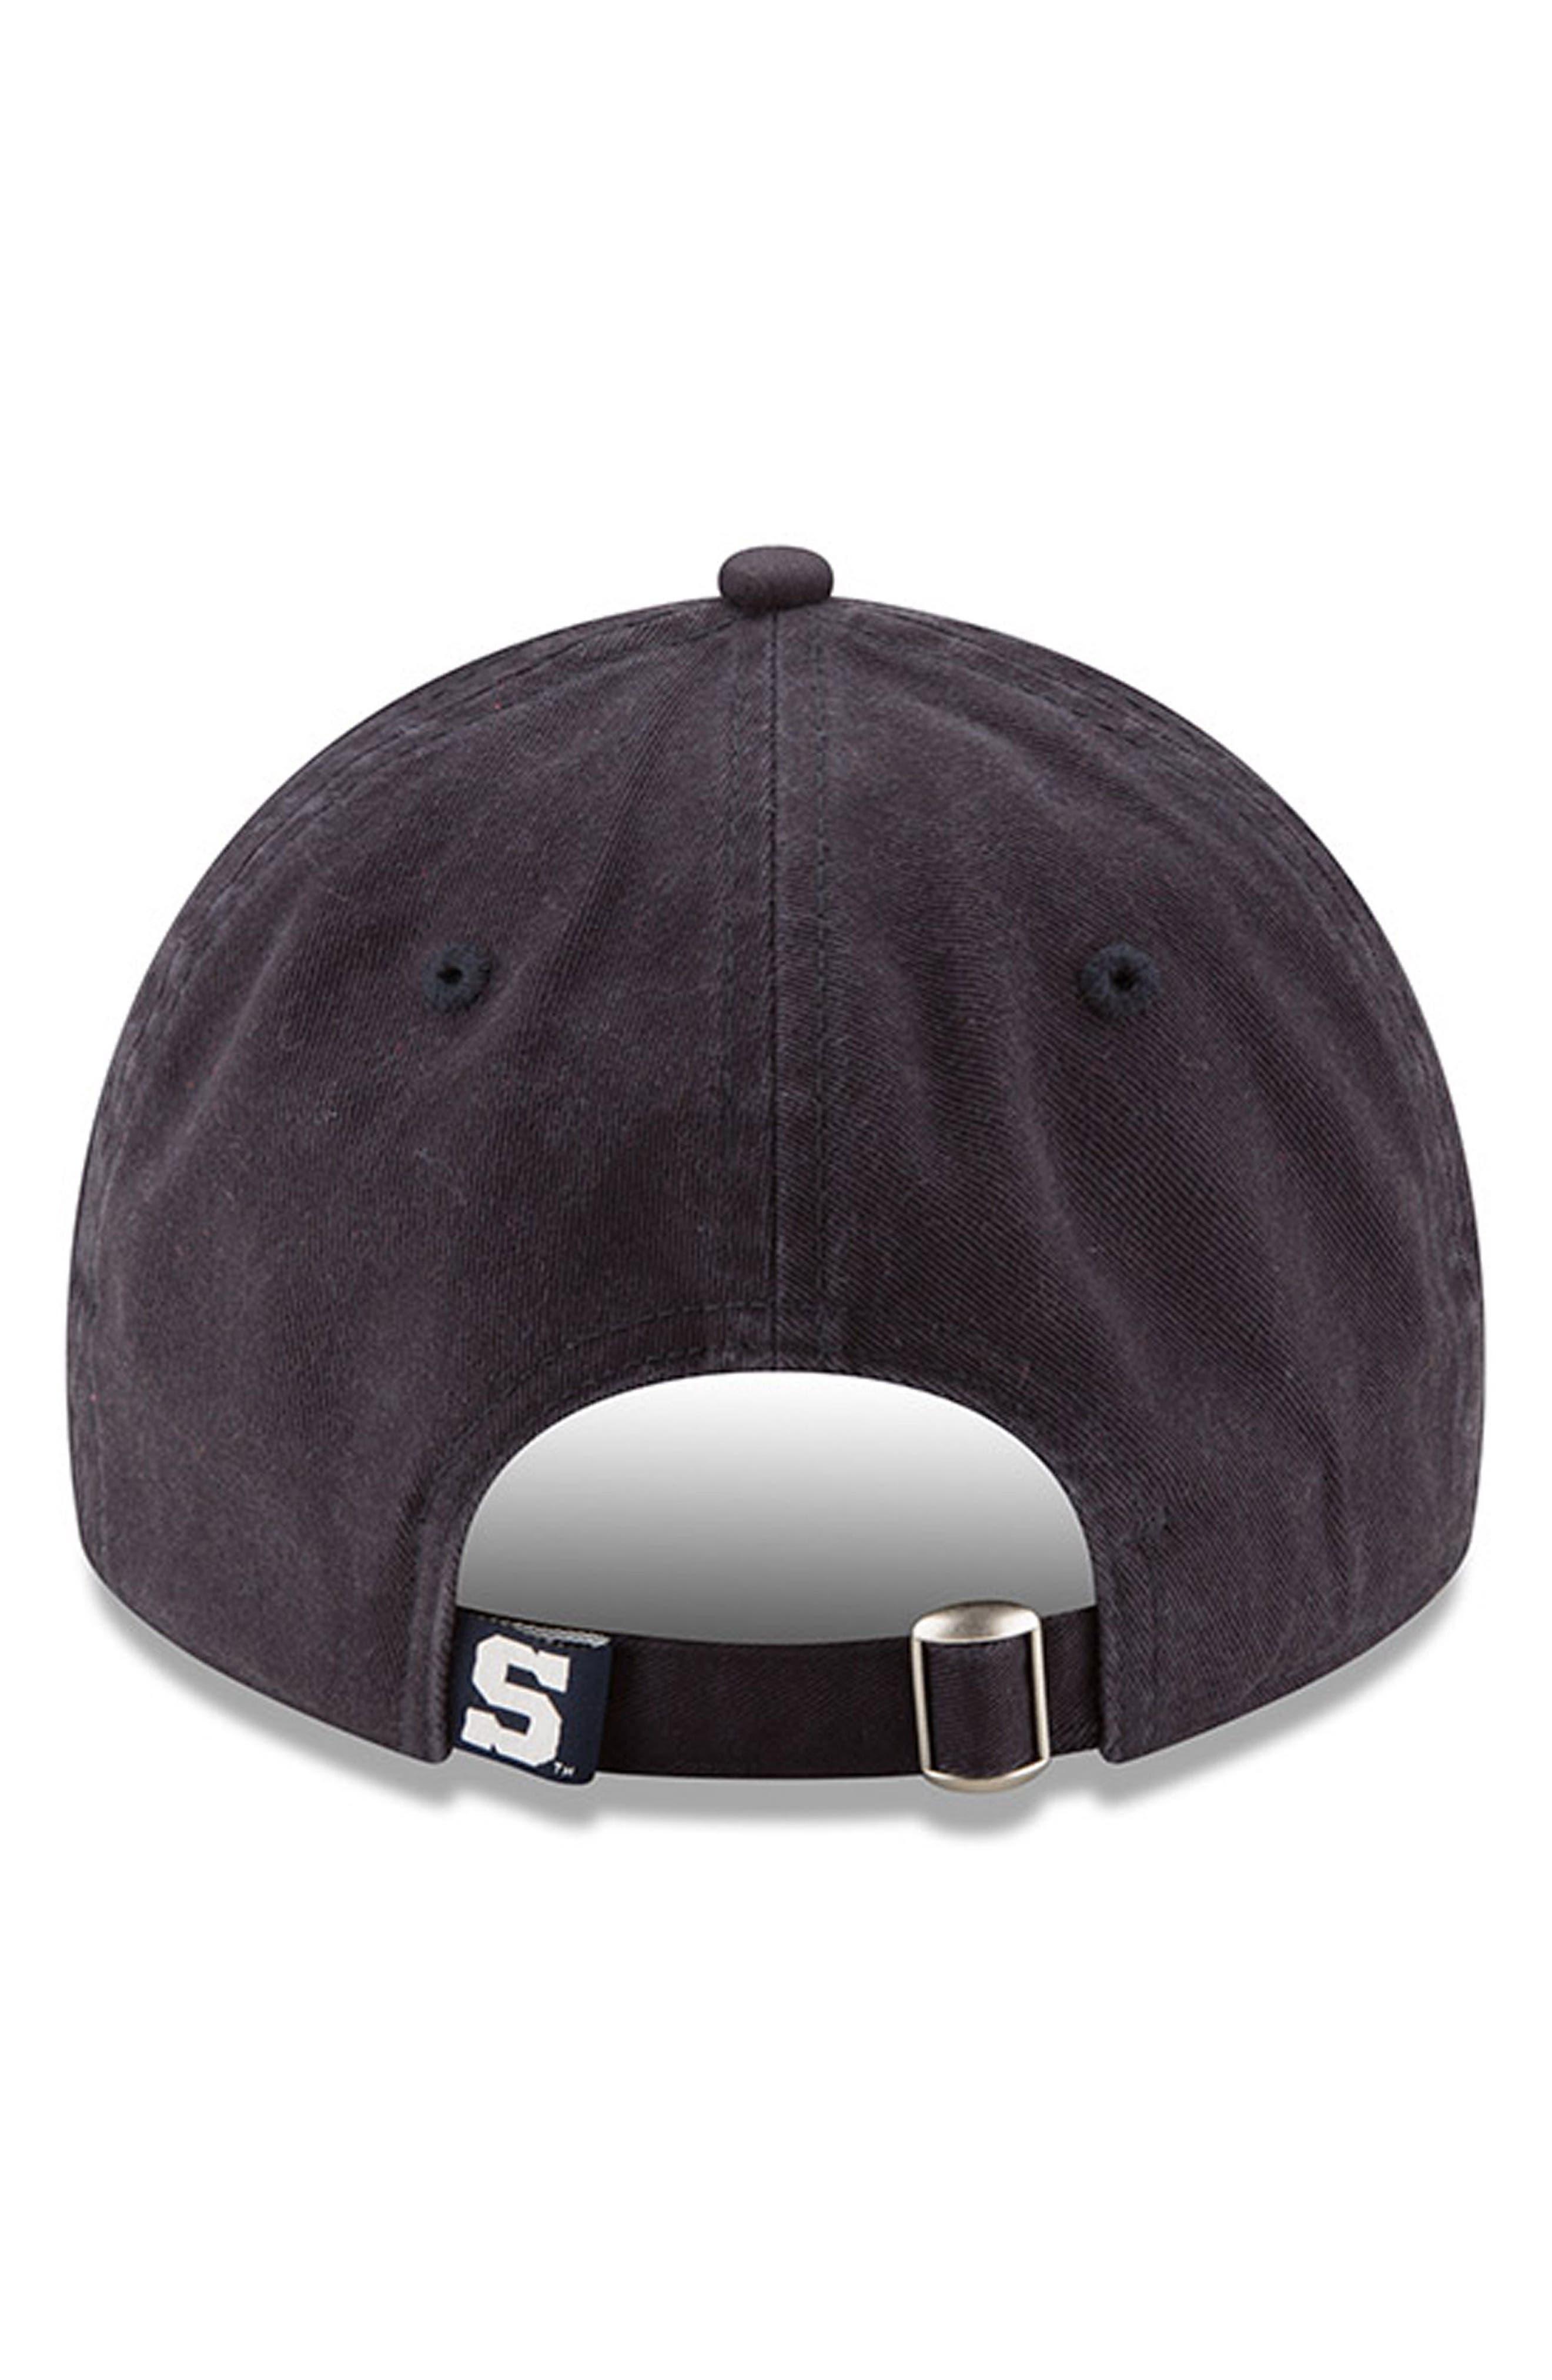 New Era Collegiate Core Classic - Penn State Nittany Lions Baseball Cap,                             Alternate thumbnail 3, color,